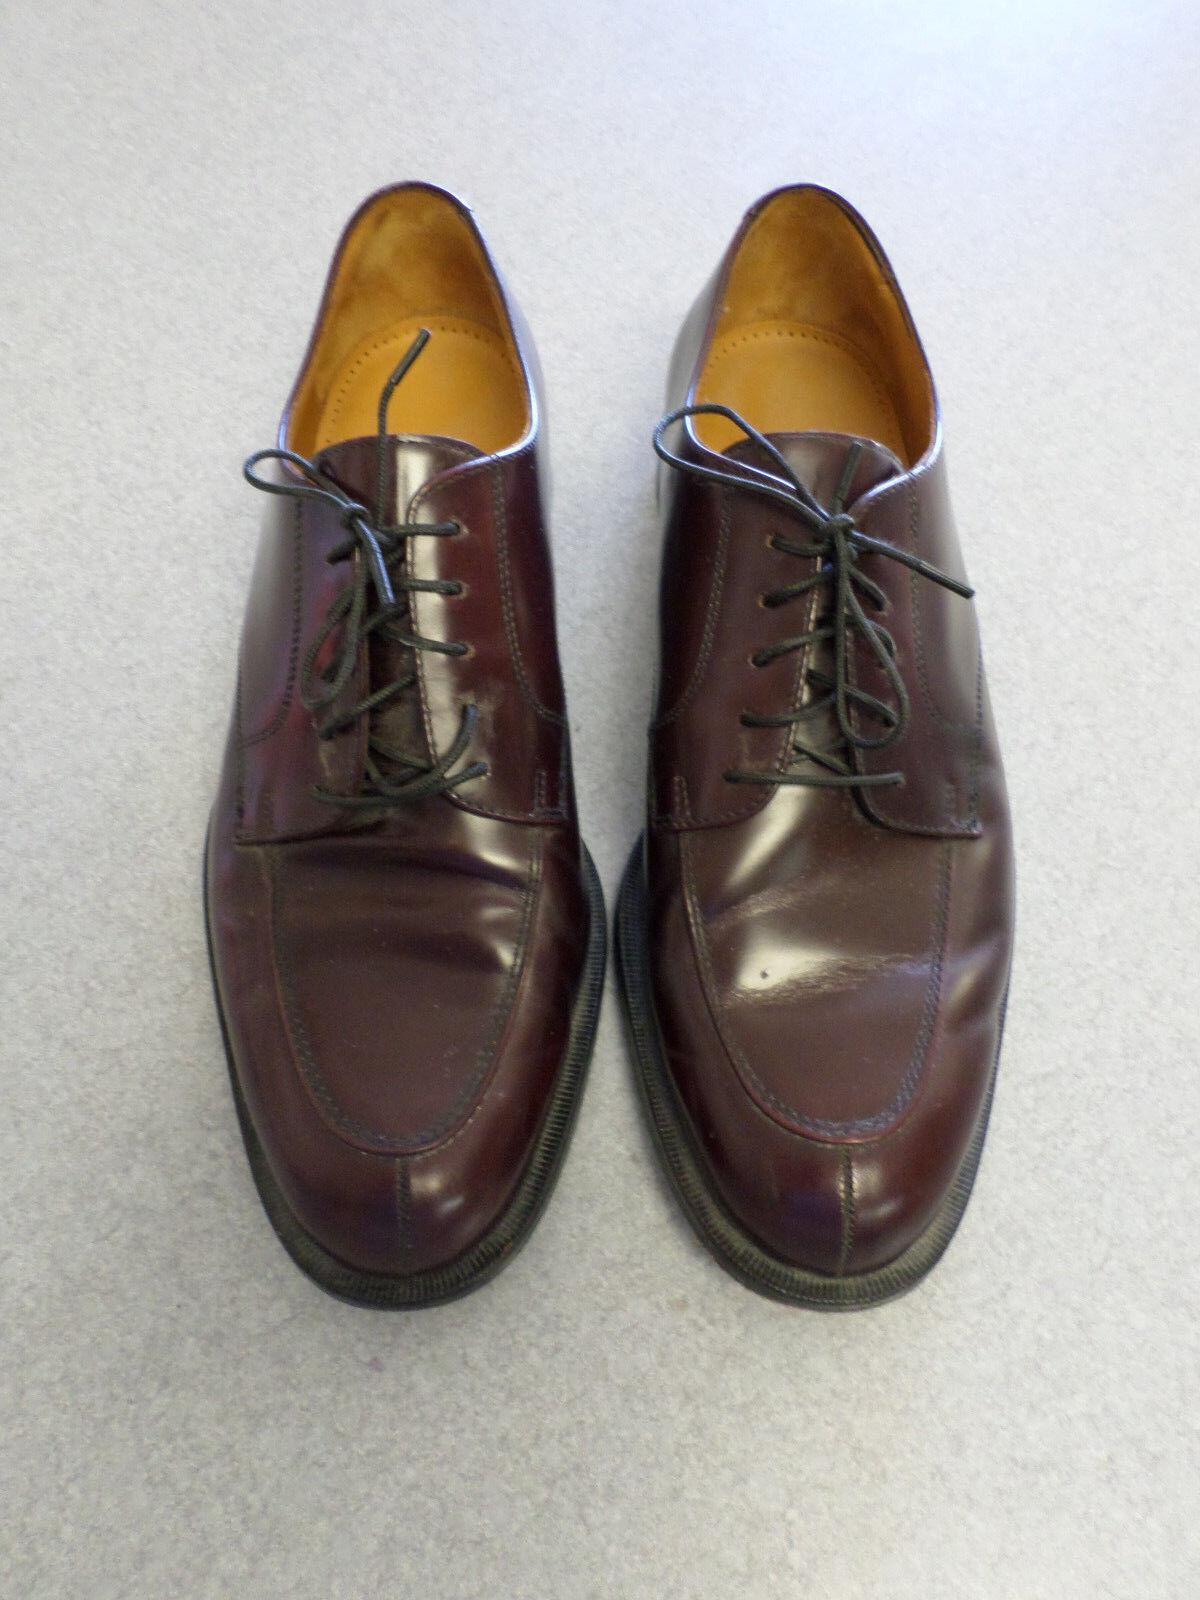 Cole Haan cordovan leather, split toe oxfords, Men's 10 M